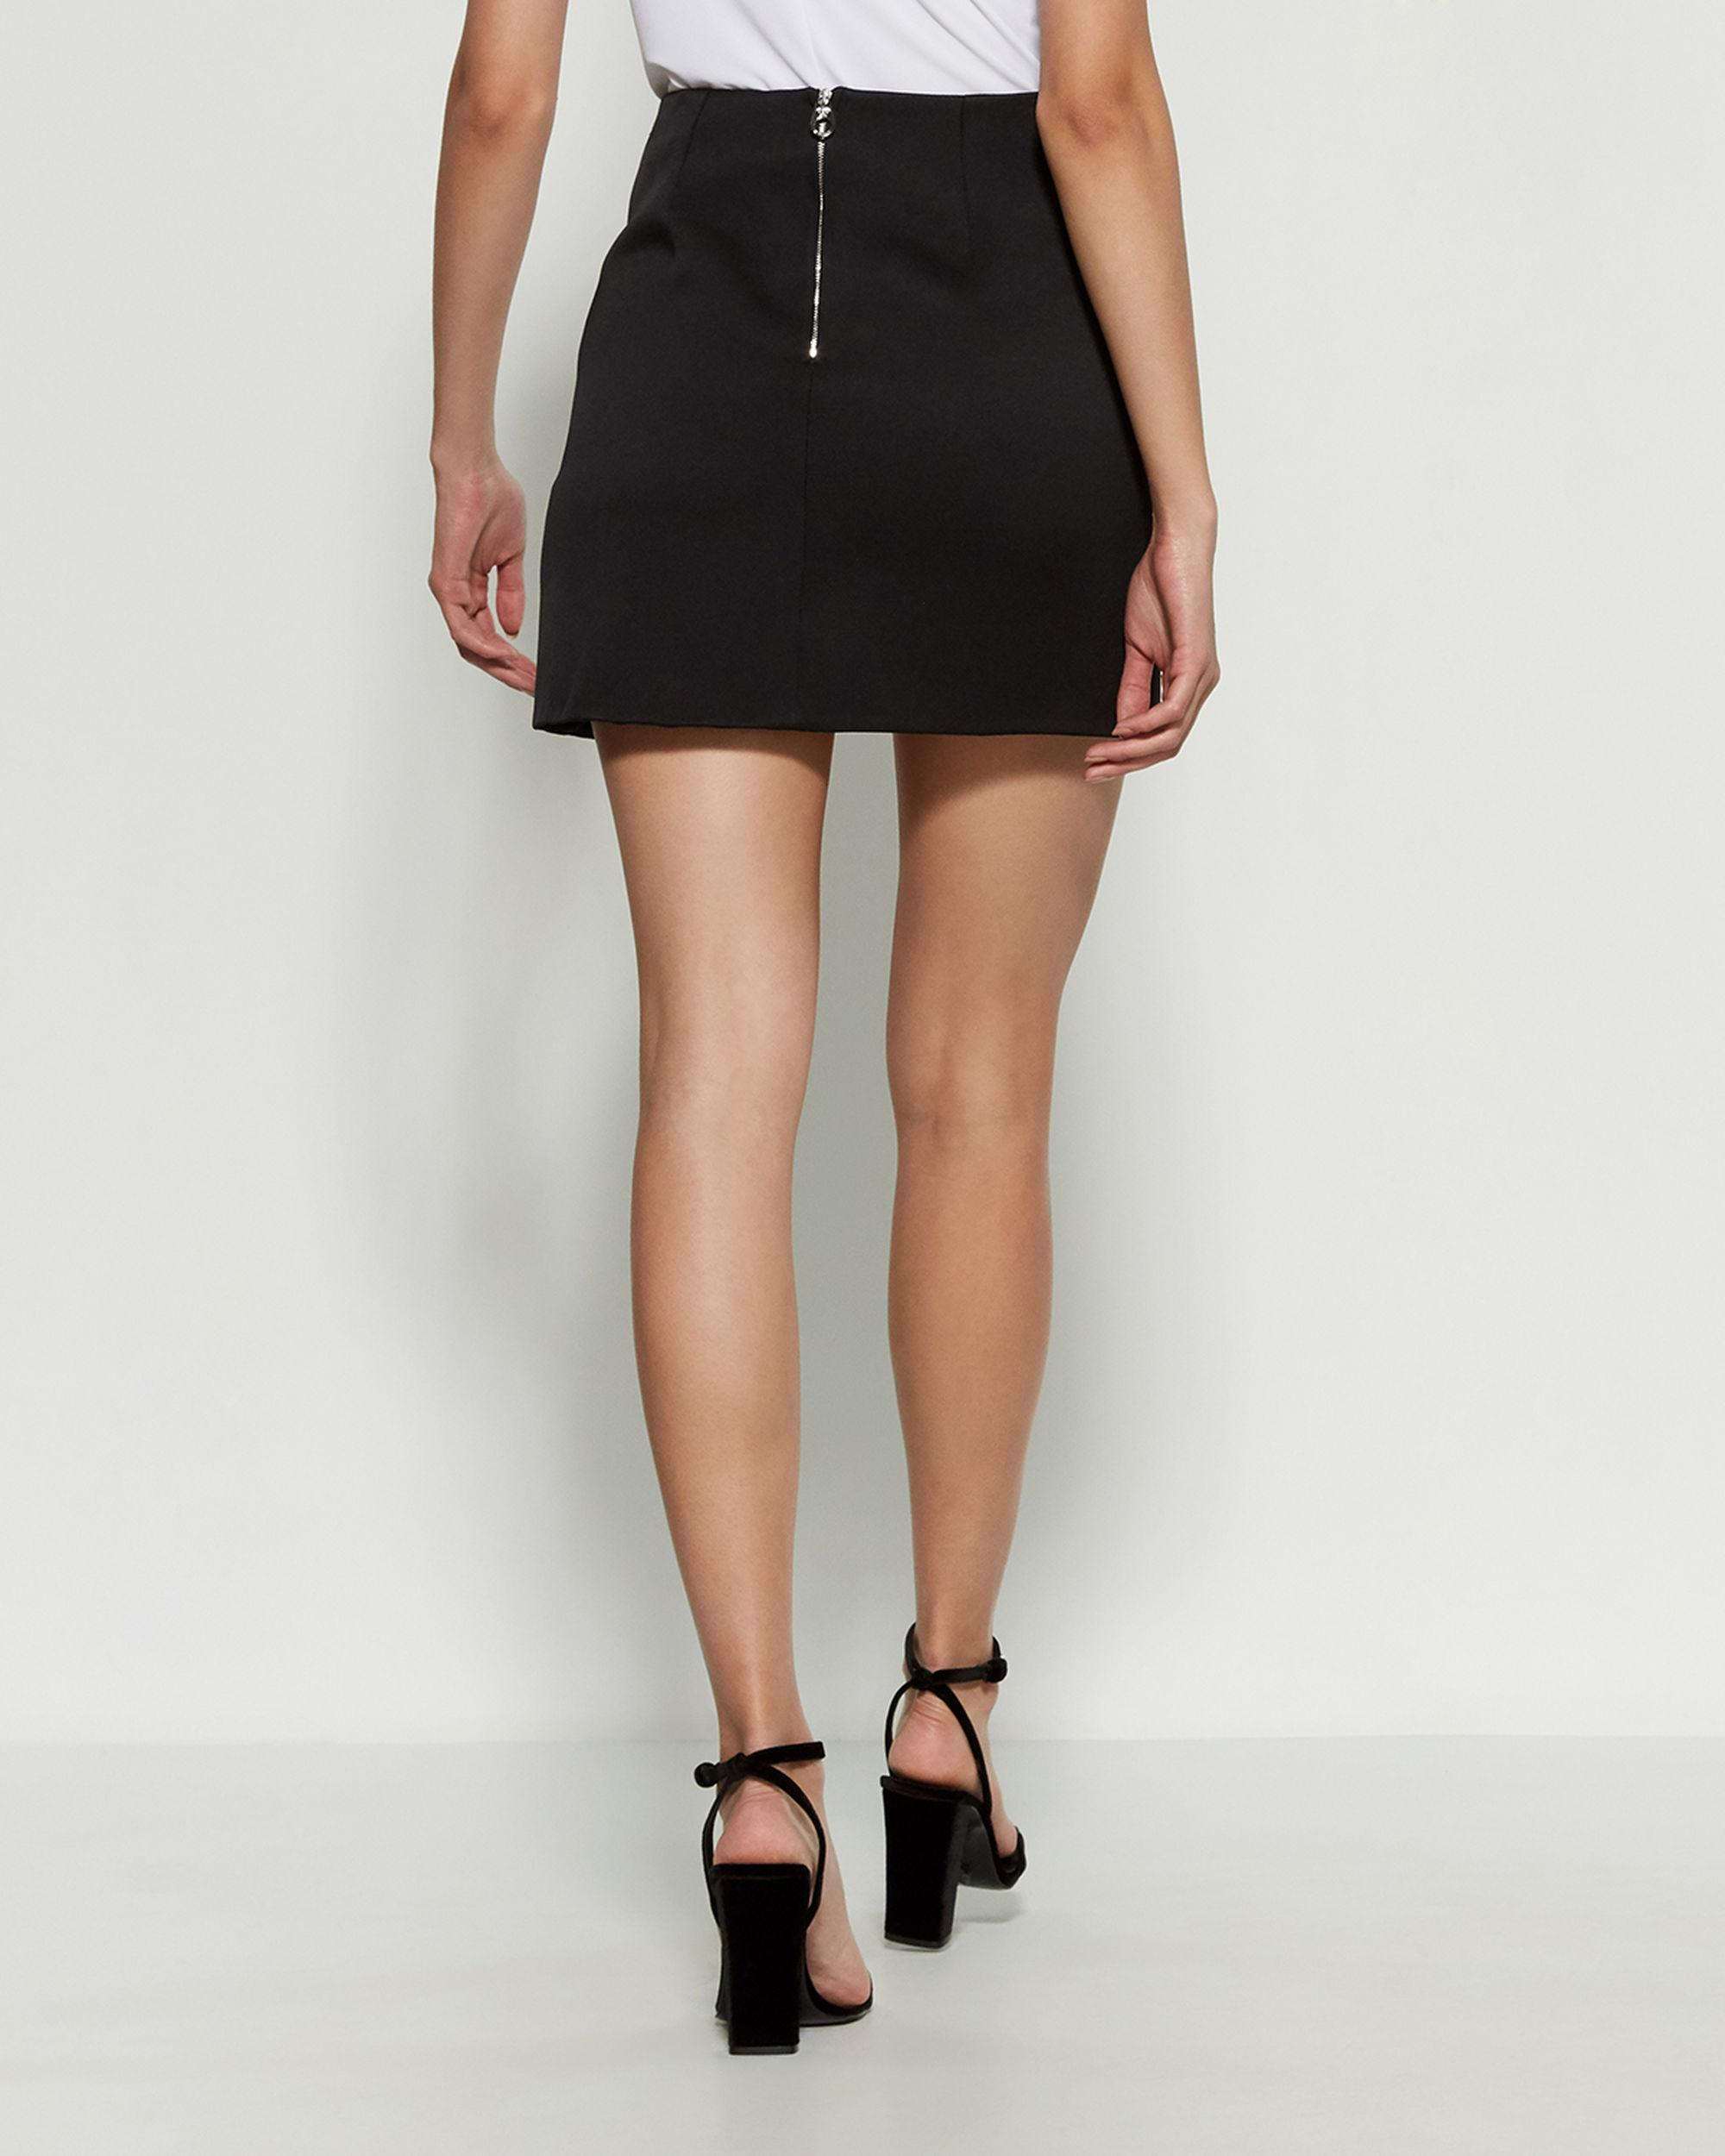 80015523 Versace Black Leather Trim Mini Skirt